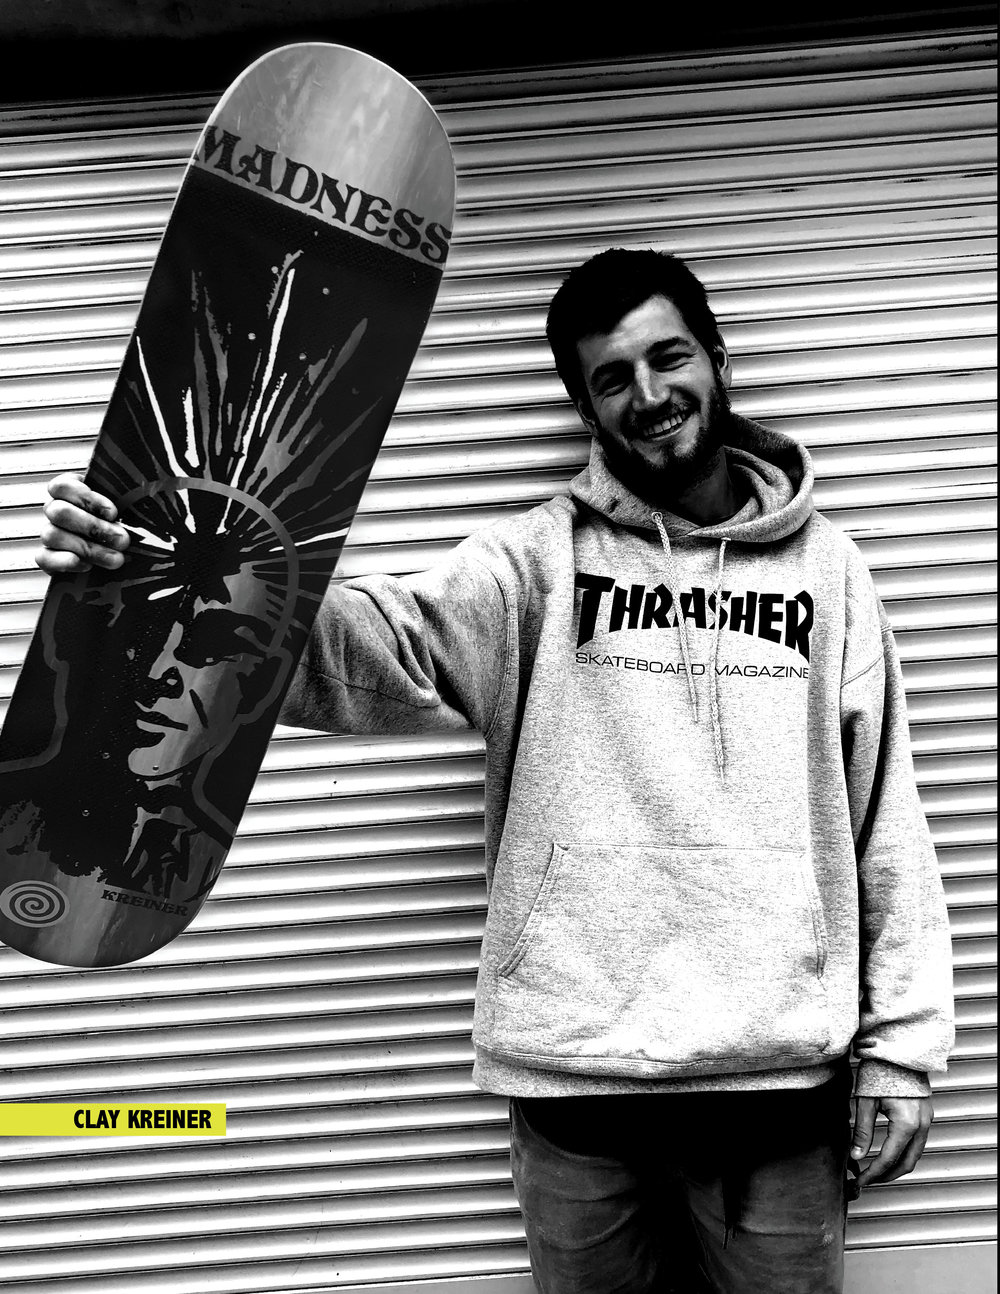 Madness_Spring_198-Clay_Kreiner_Pro_Debut.jpg